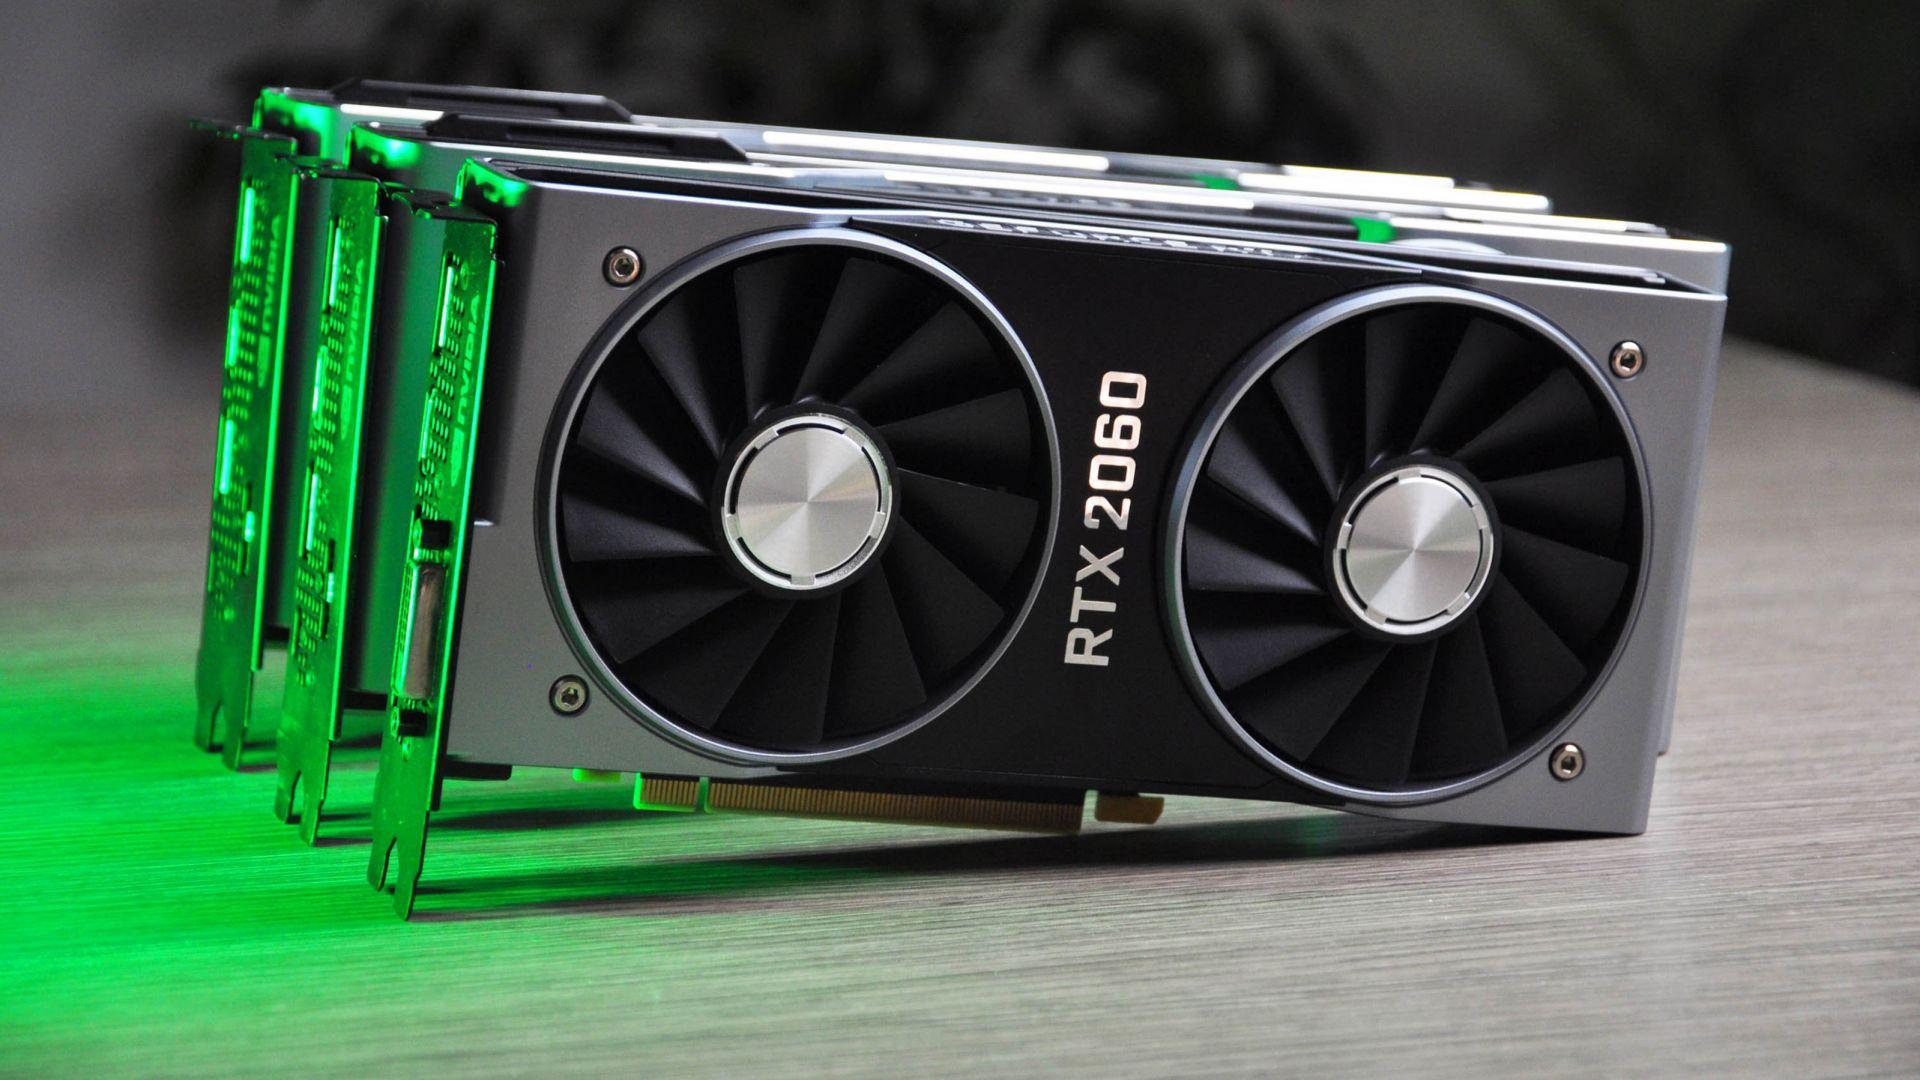 Wallpaper Nvidia GeForce RTX 2060, CES 2019, graphics card, 4K, Hi-Tech #21028